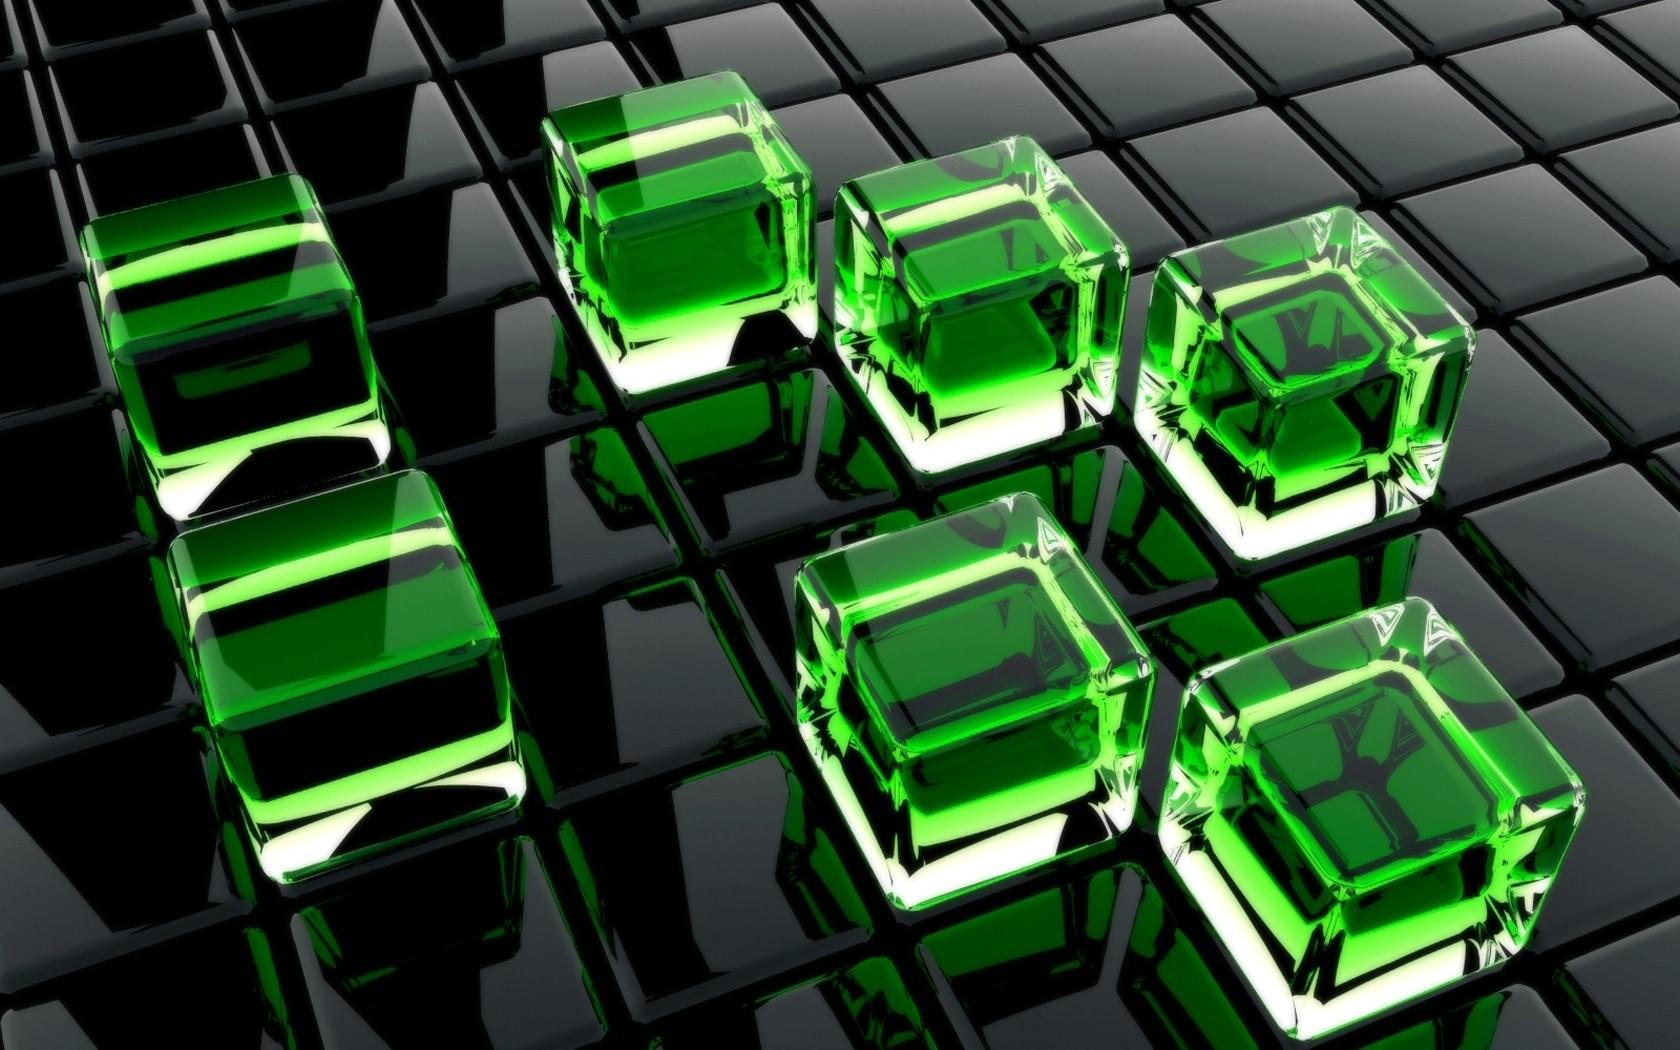 3D Wallpapers | Free Download 3D HD Desktop Photos Backgrounds Images